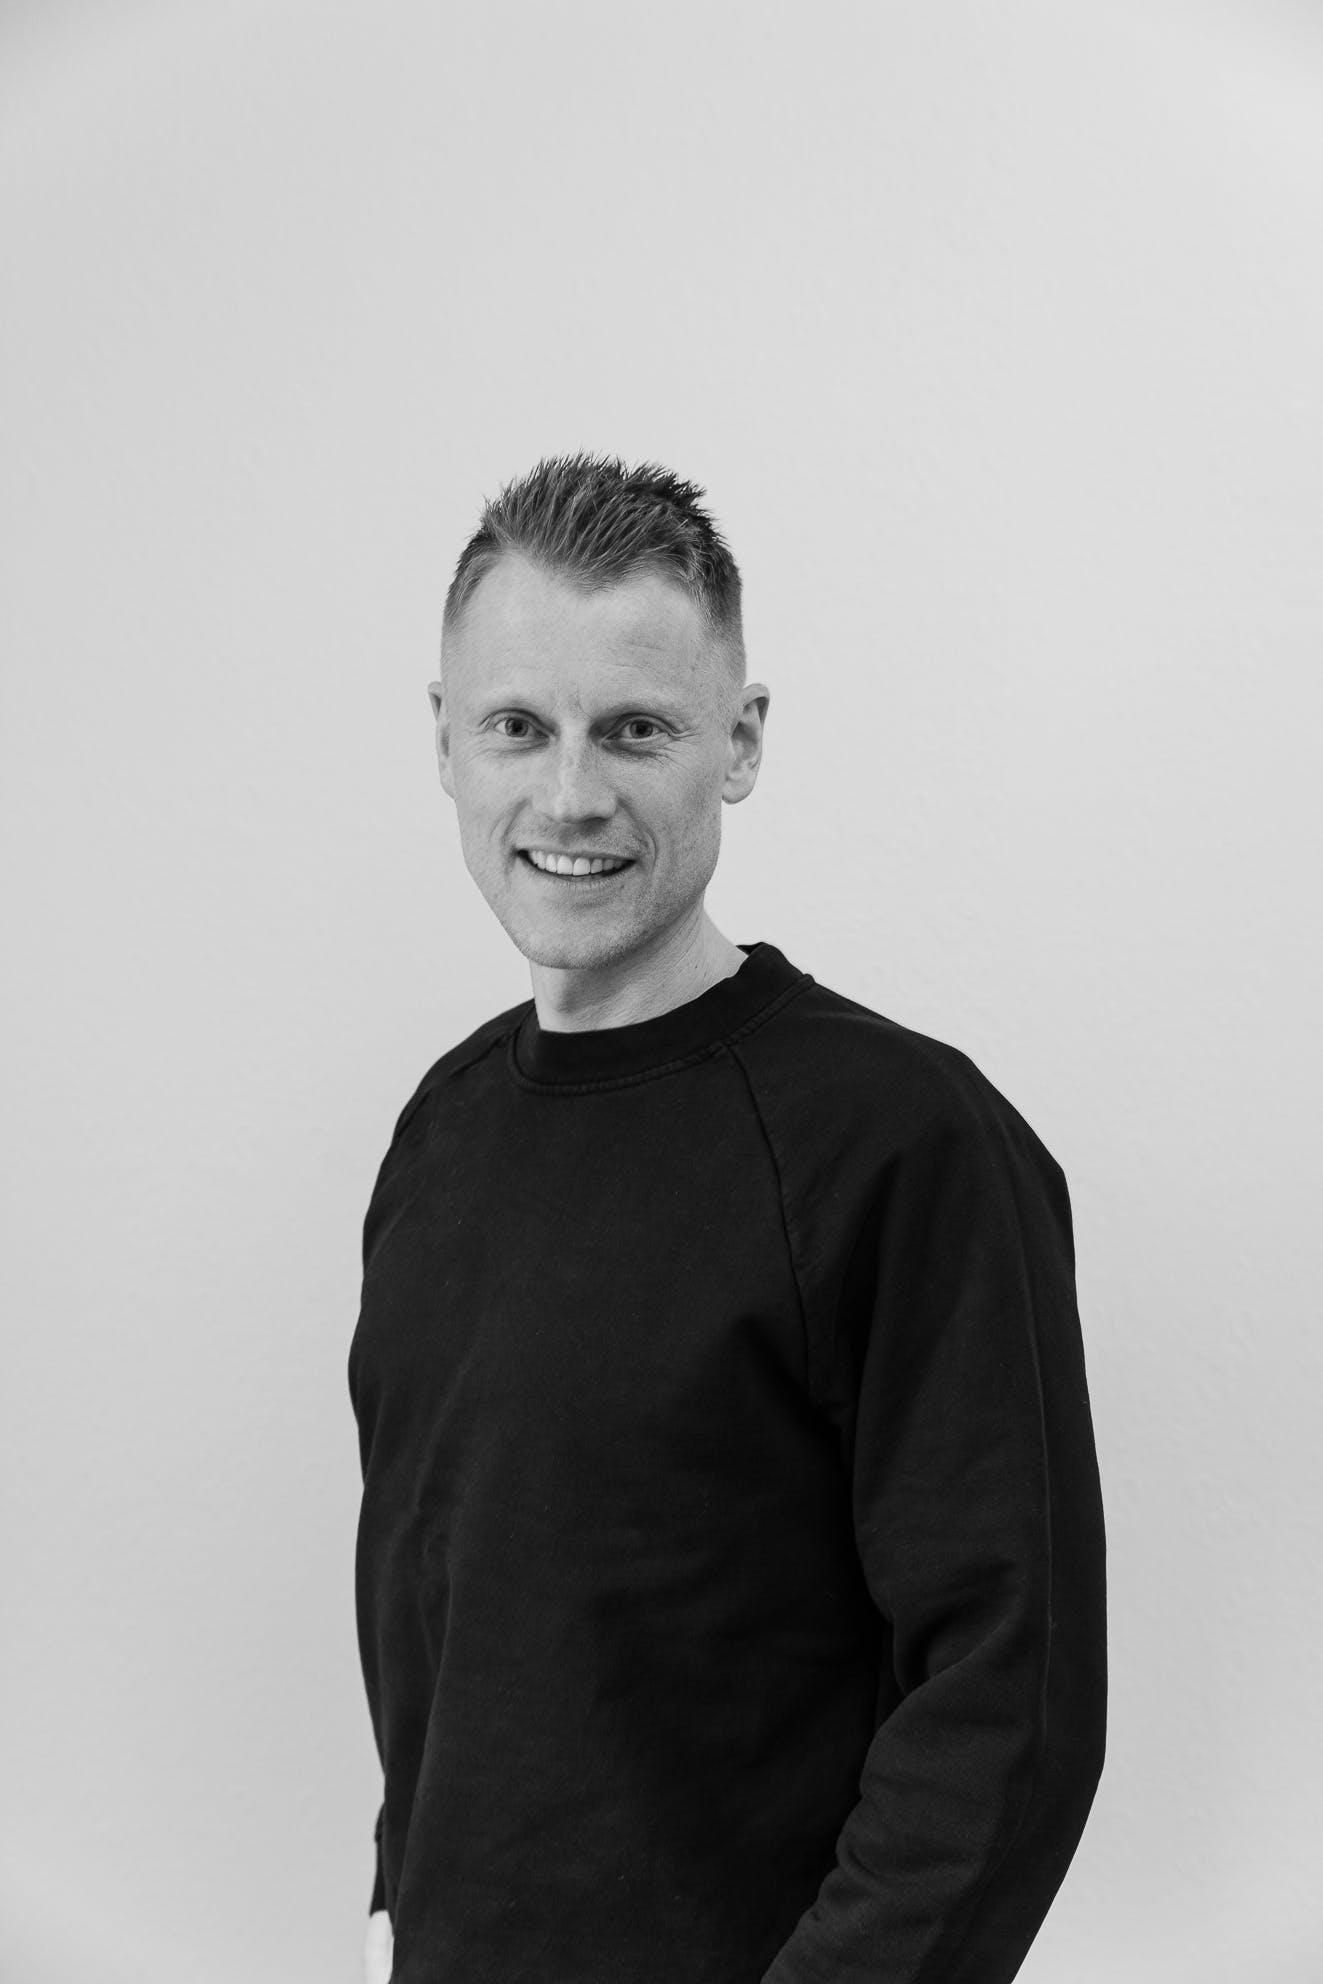 Kristian David Elgen